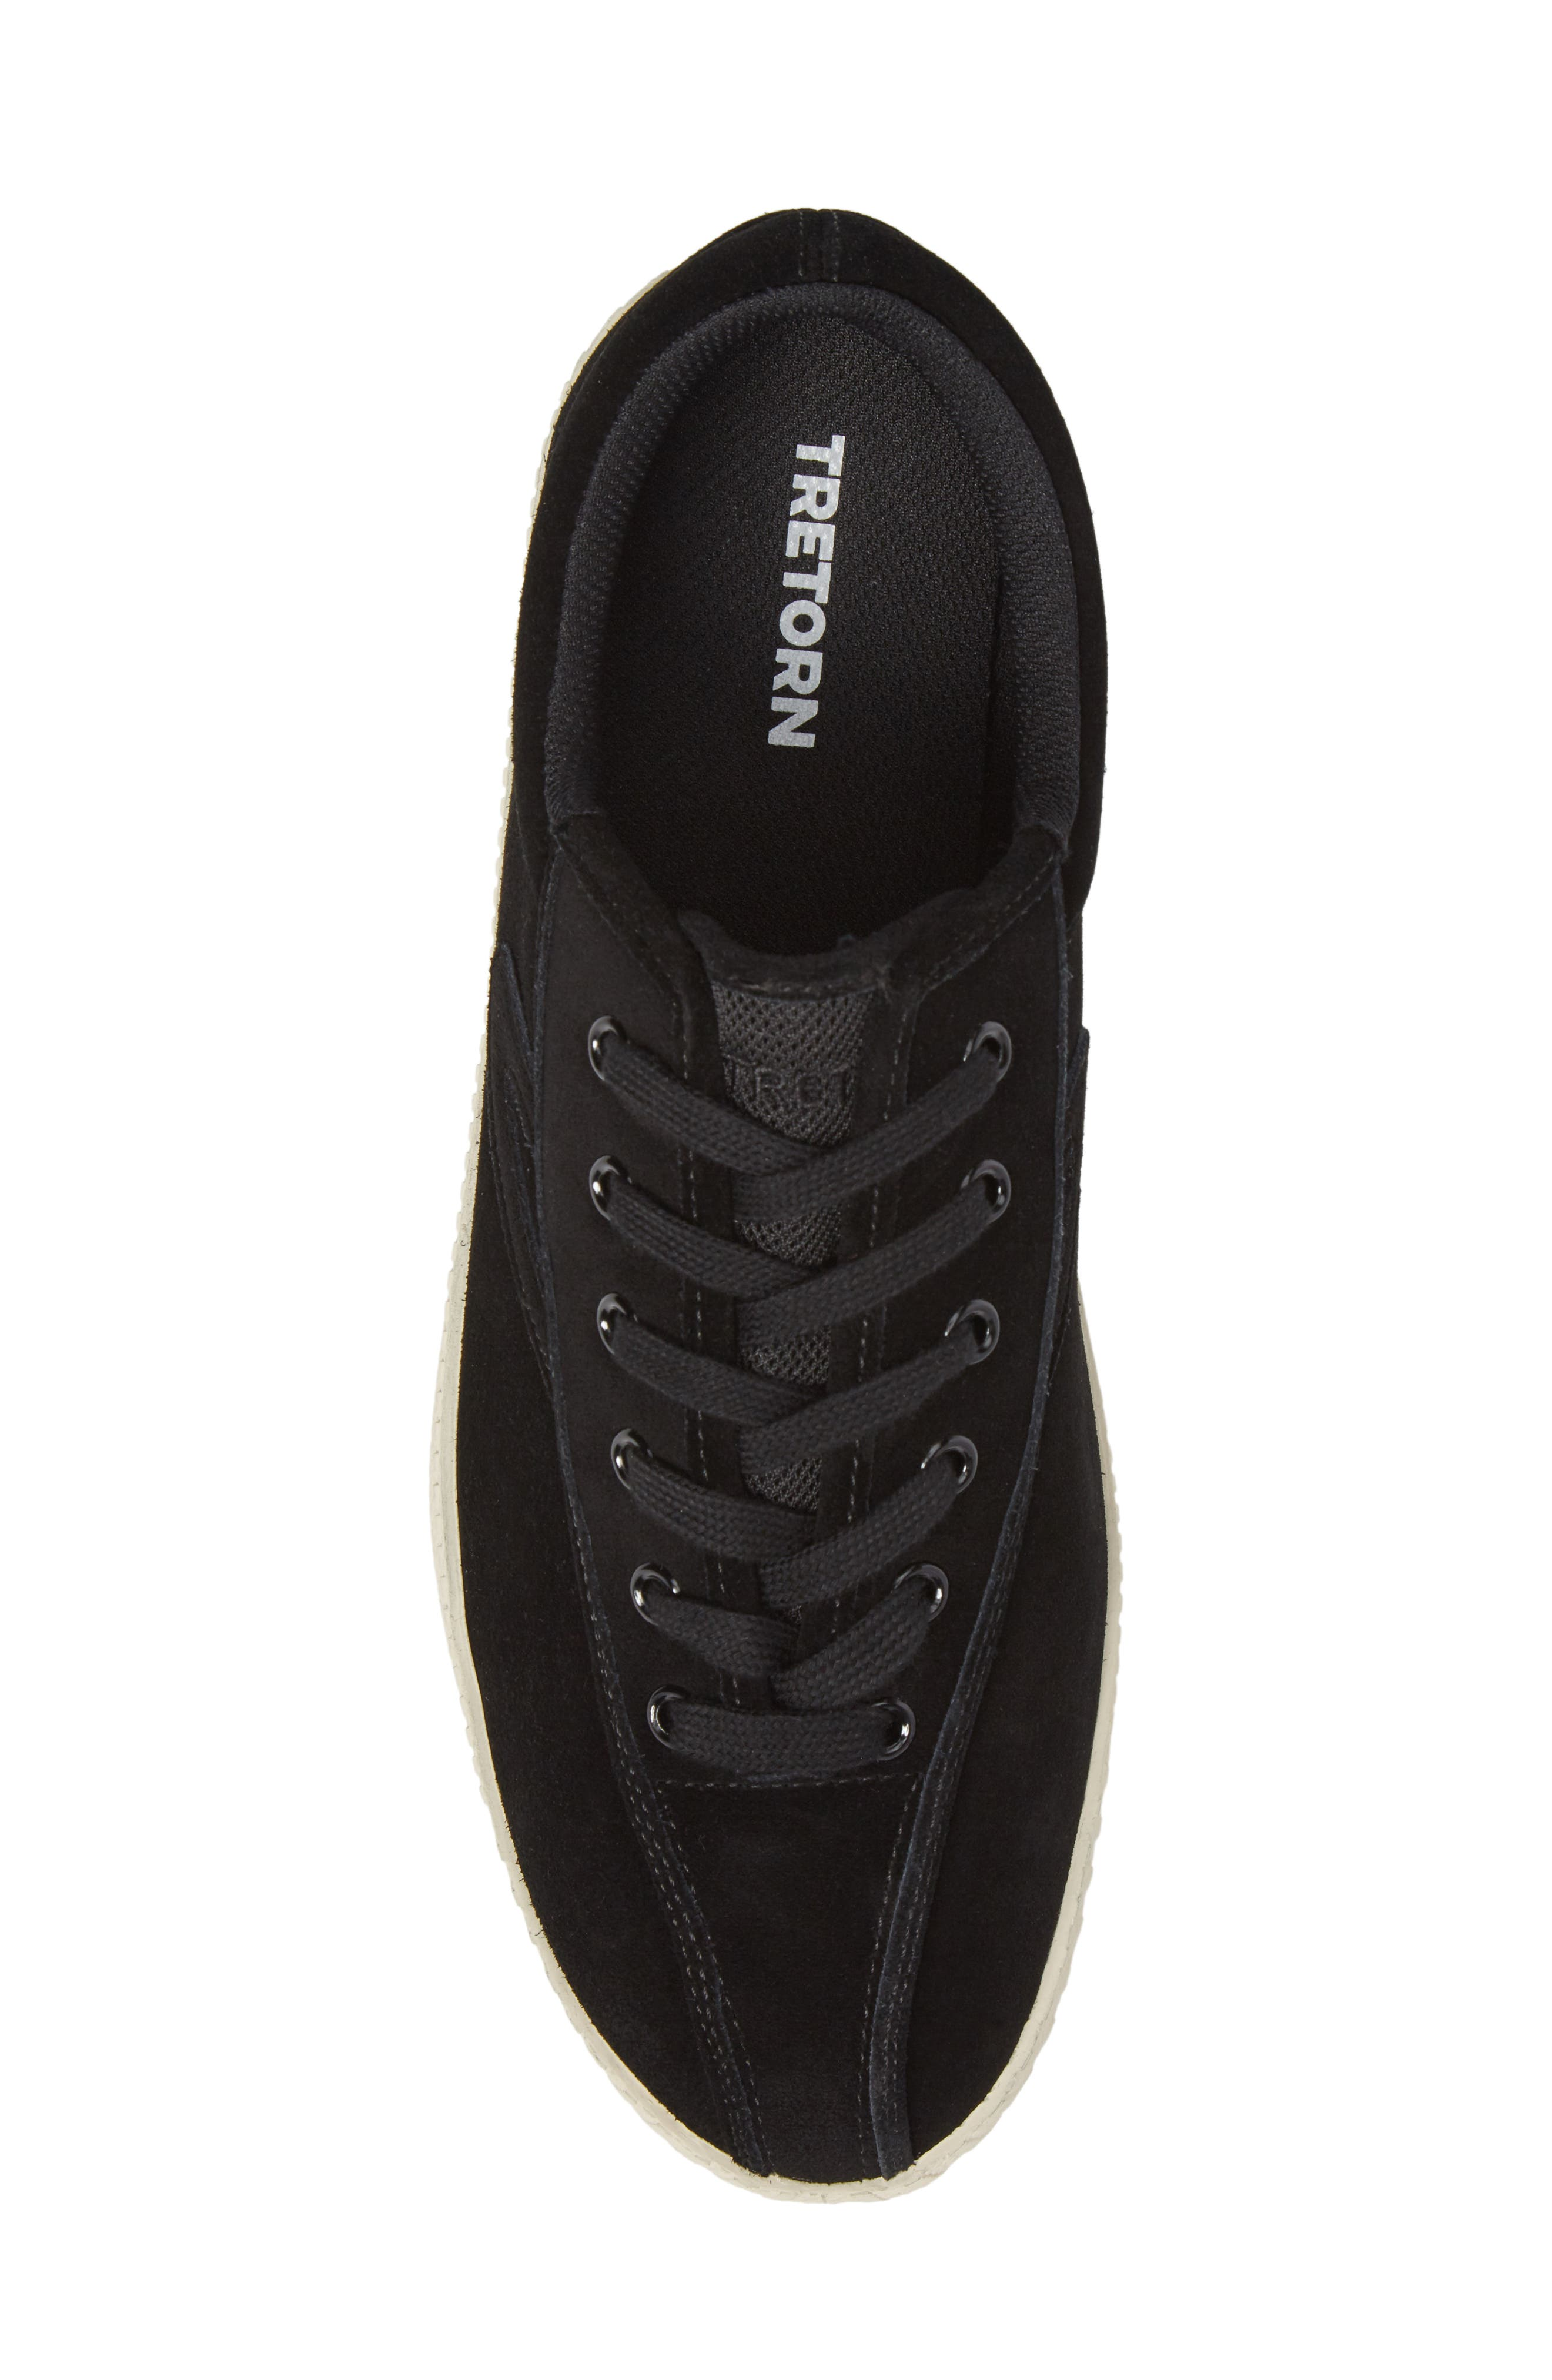 Nylite 16 Sneaker,                             Alternate thumbnail 5, color,                             BLACK/ BLACK SUEDE